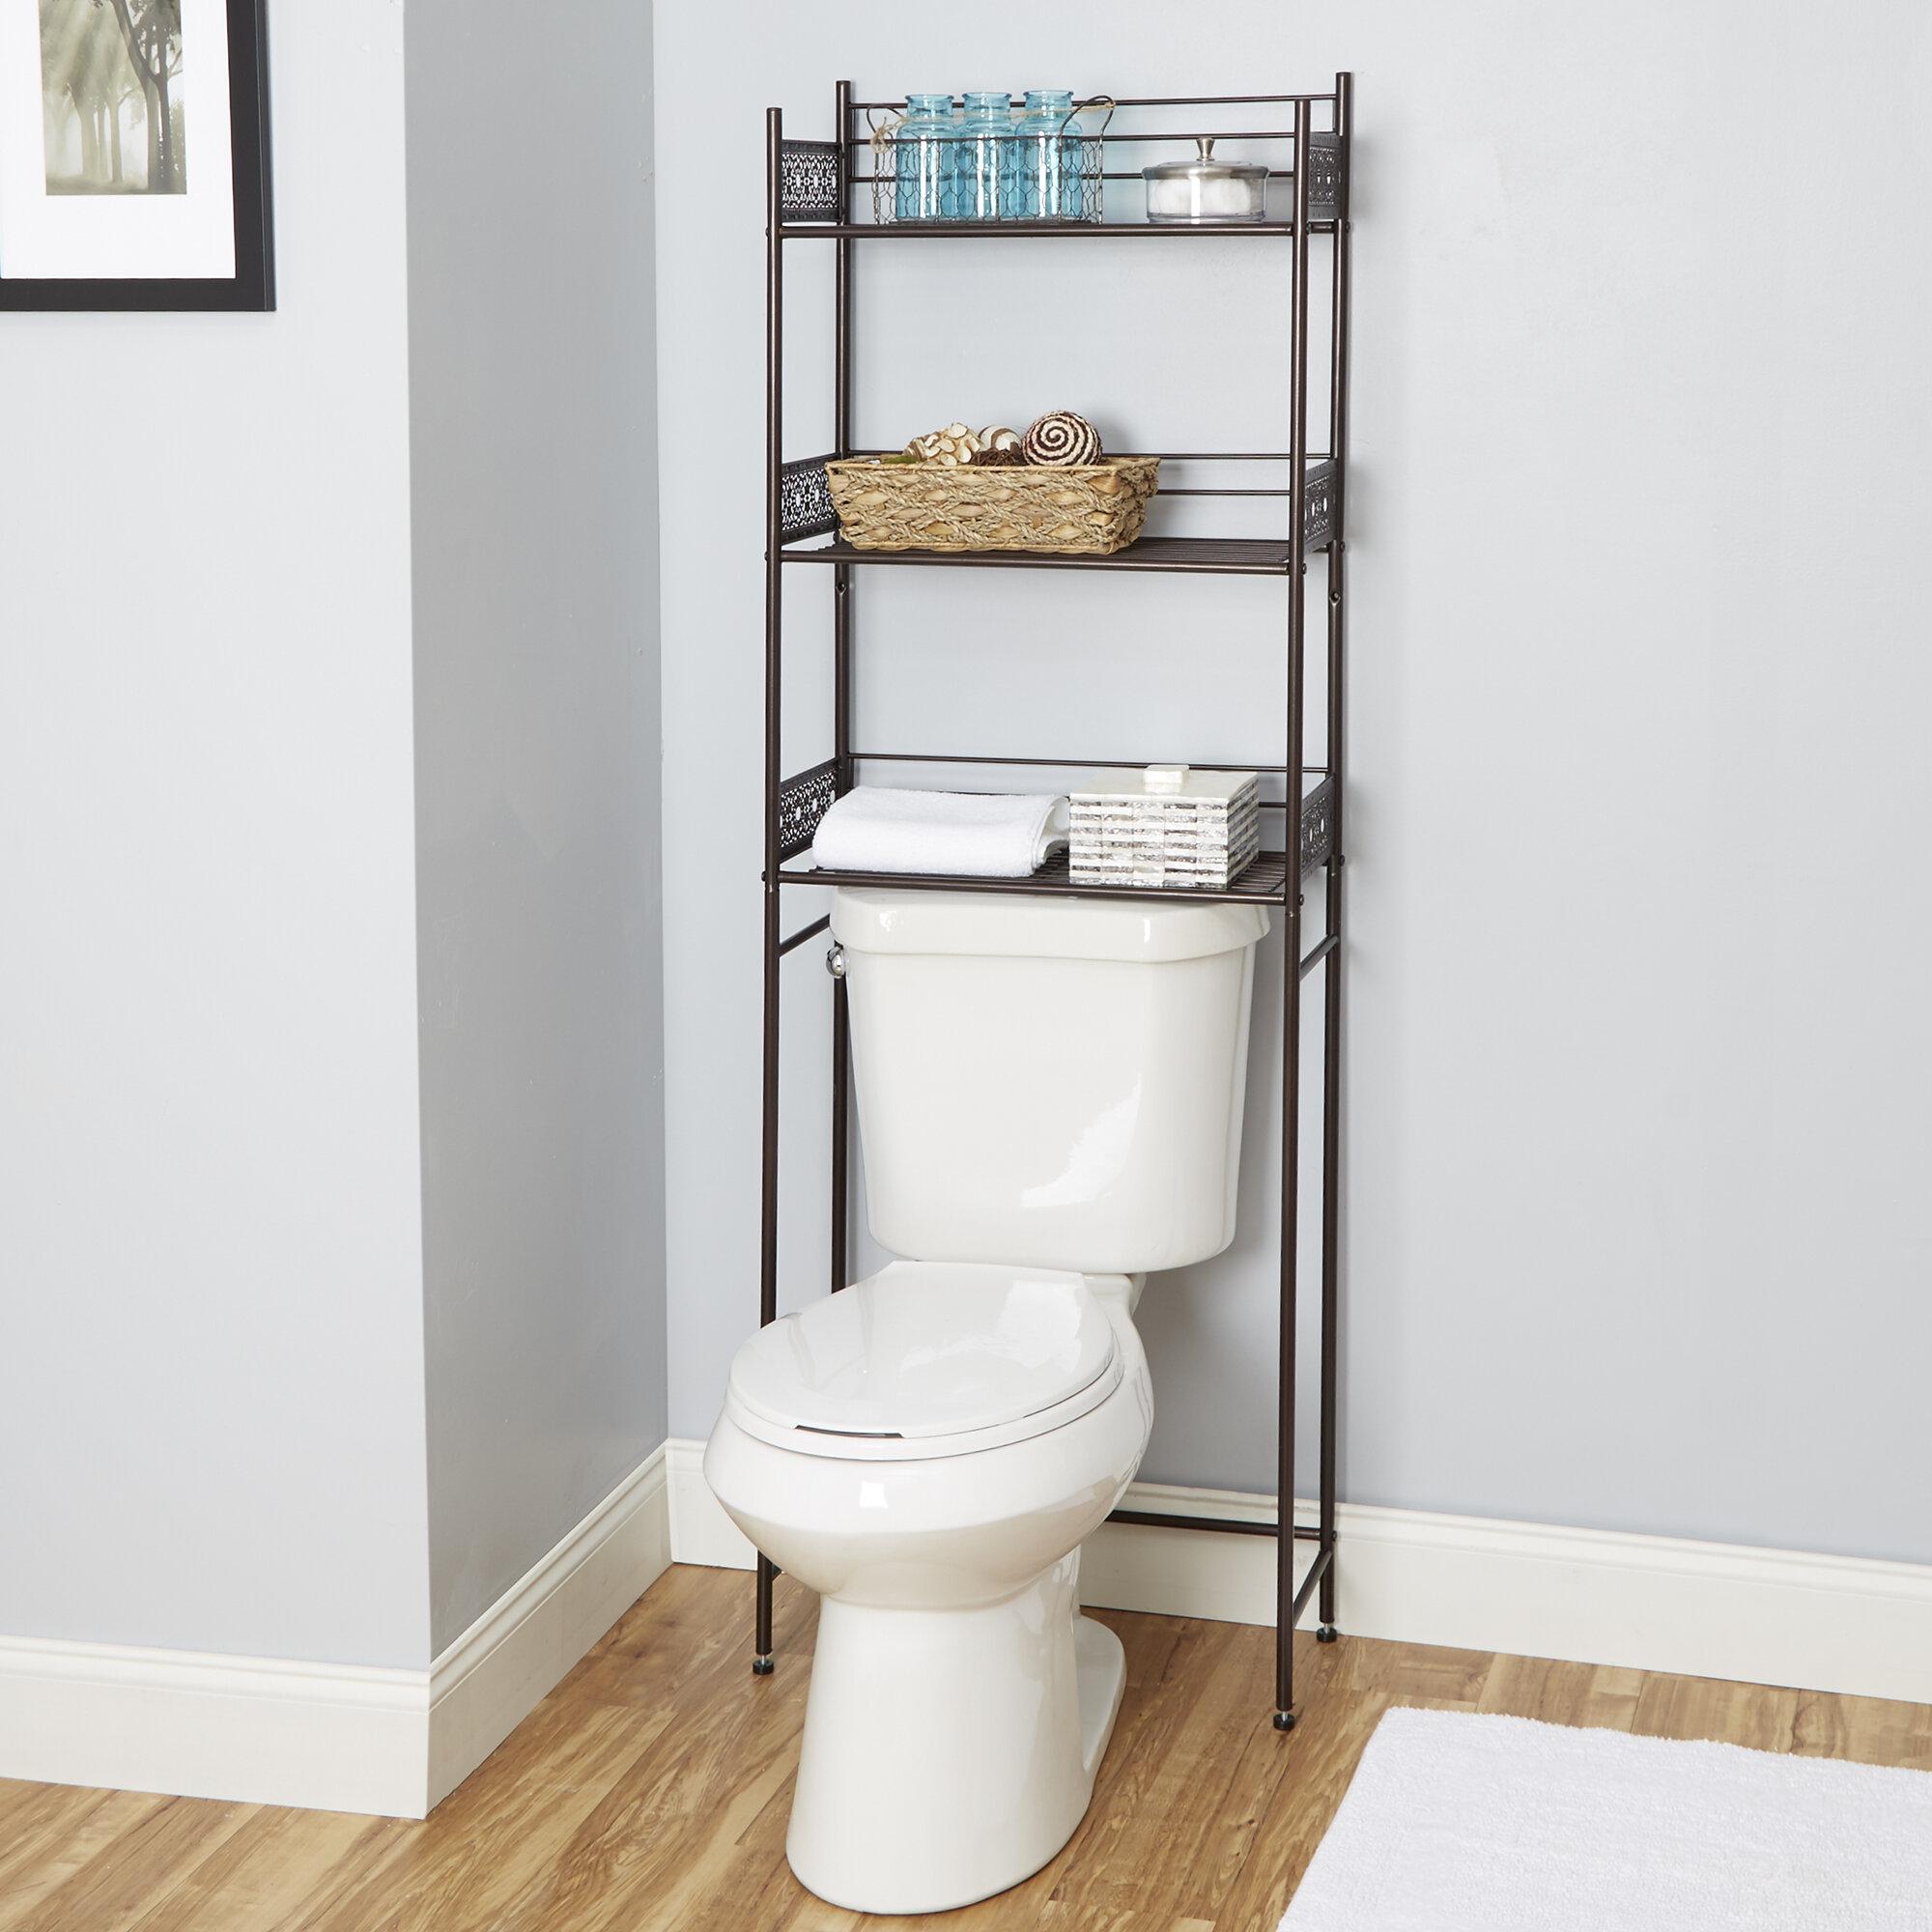 Popular Bath Scroll Over The Toilet Bathroom Space Saver ORB